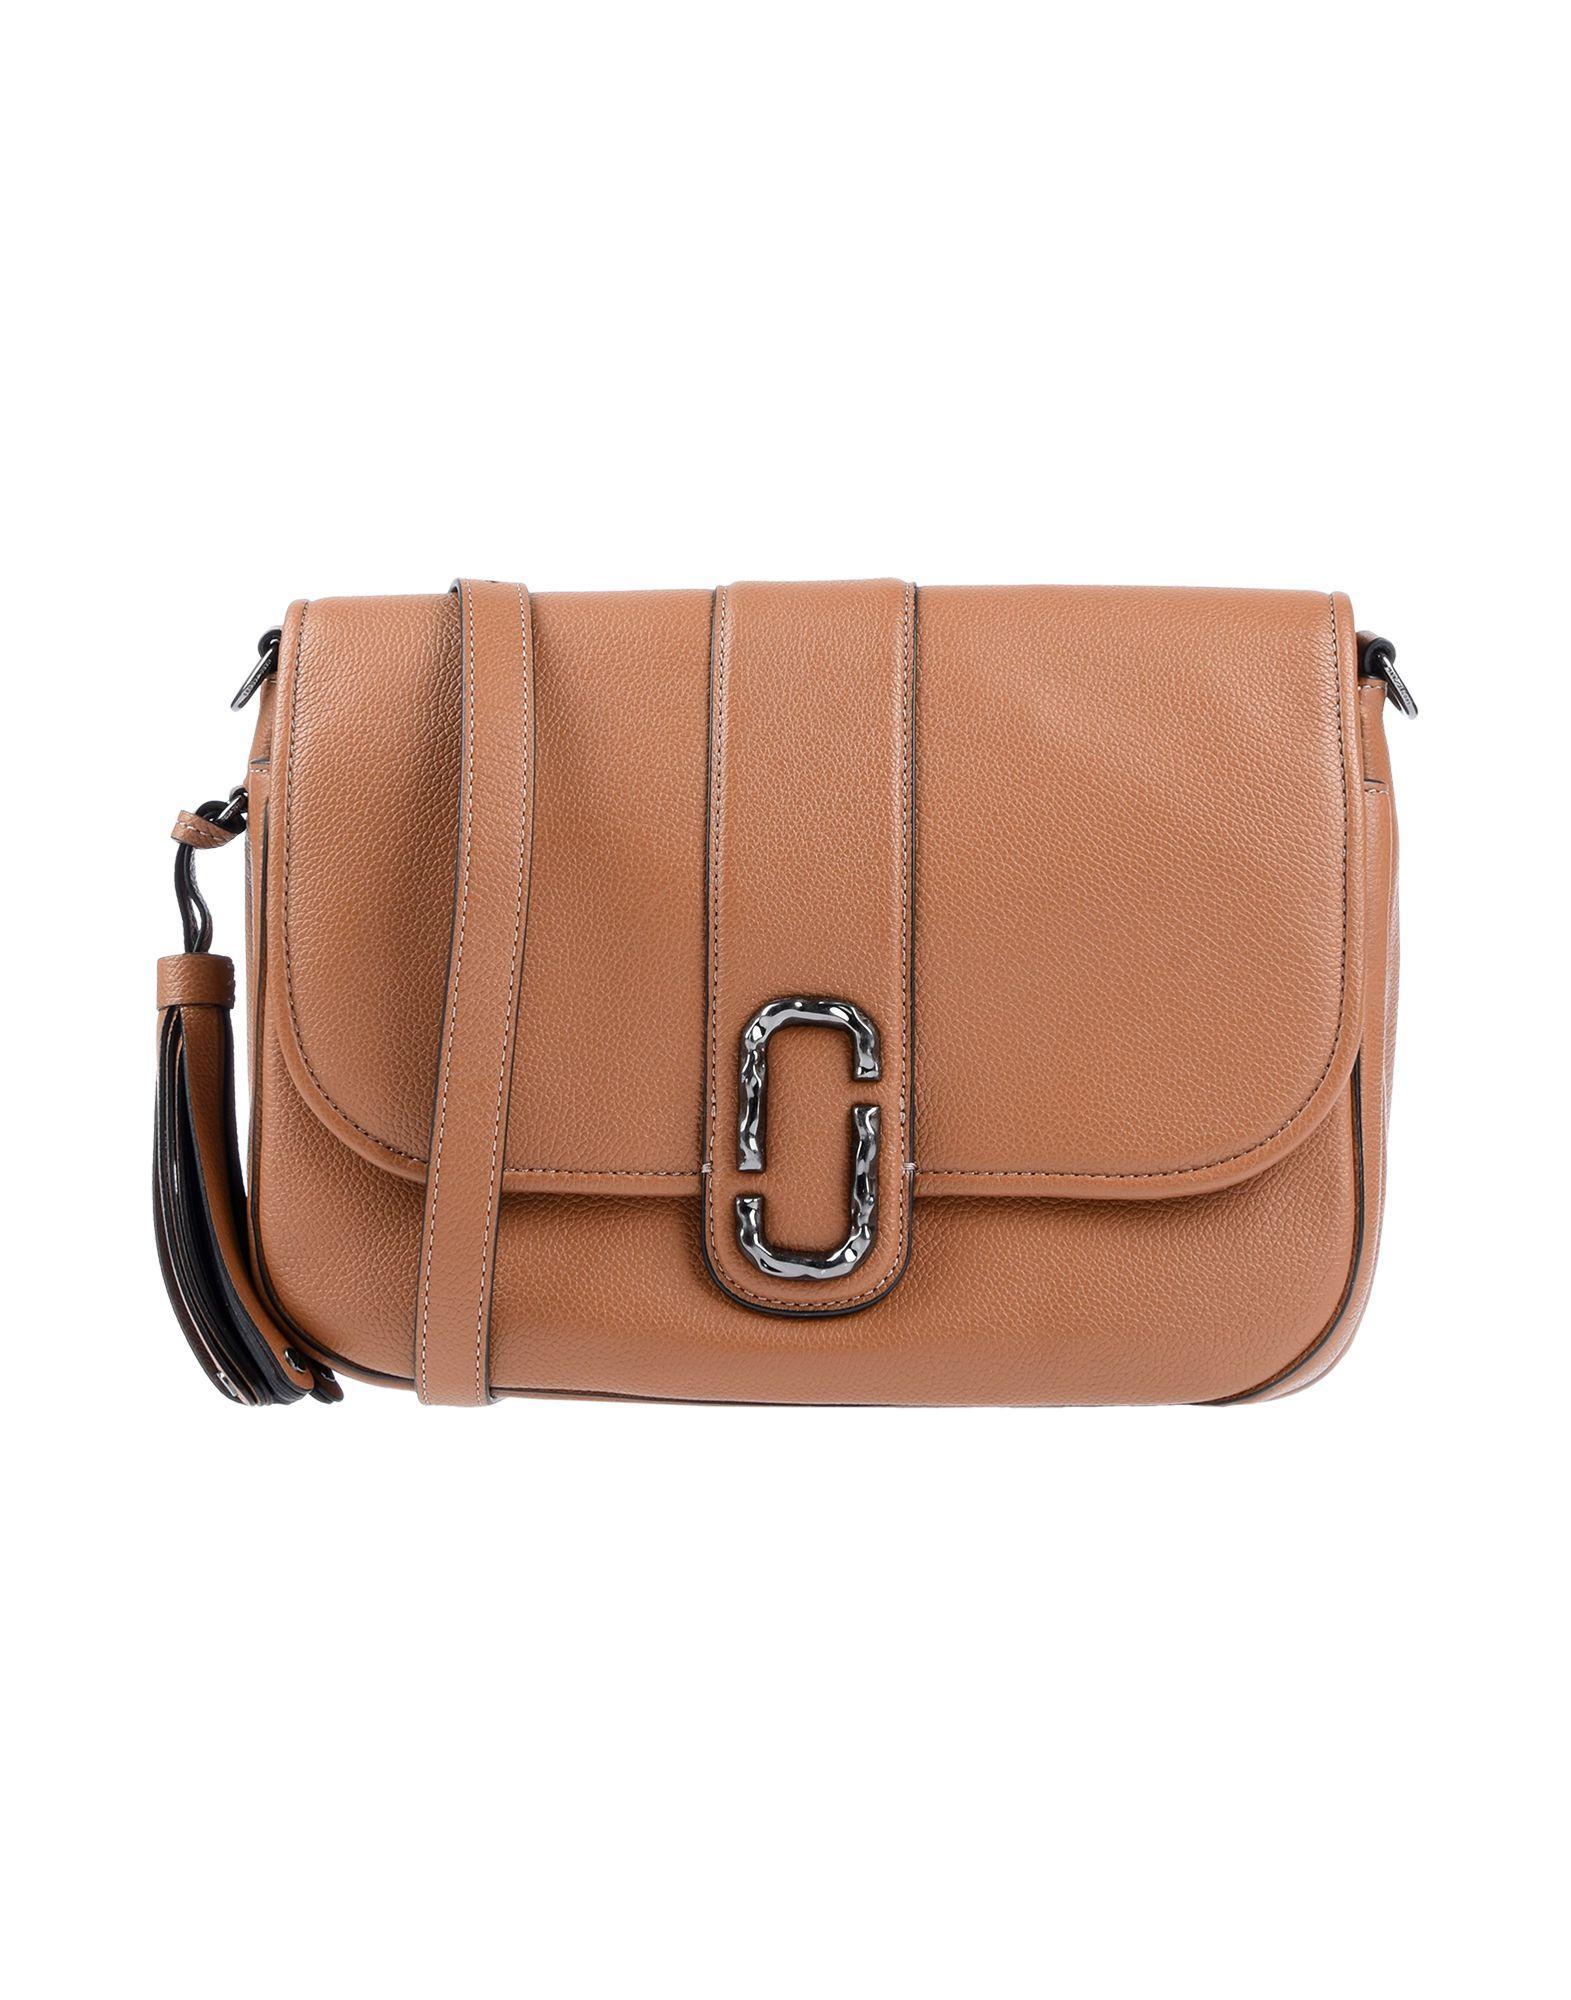 80e00167559d Lyst - Marc Jacobs Cross-body Bag in Brown